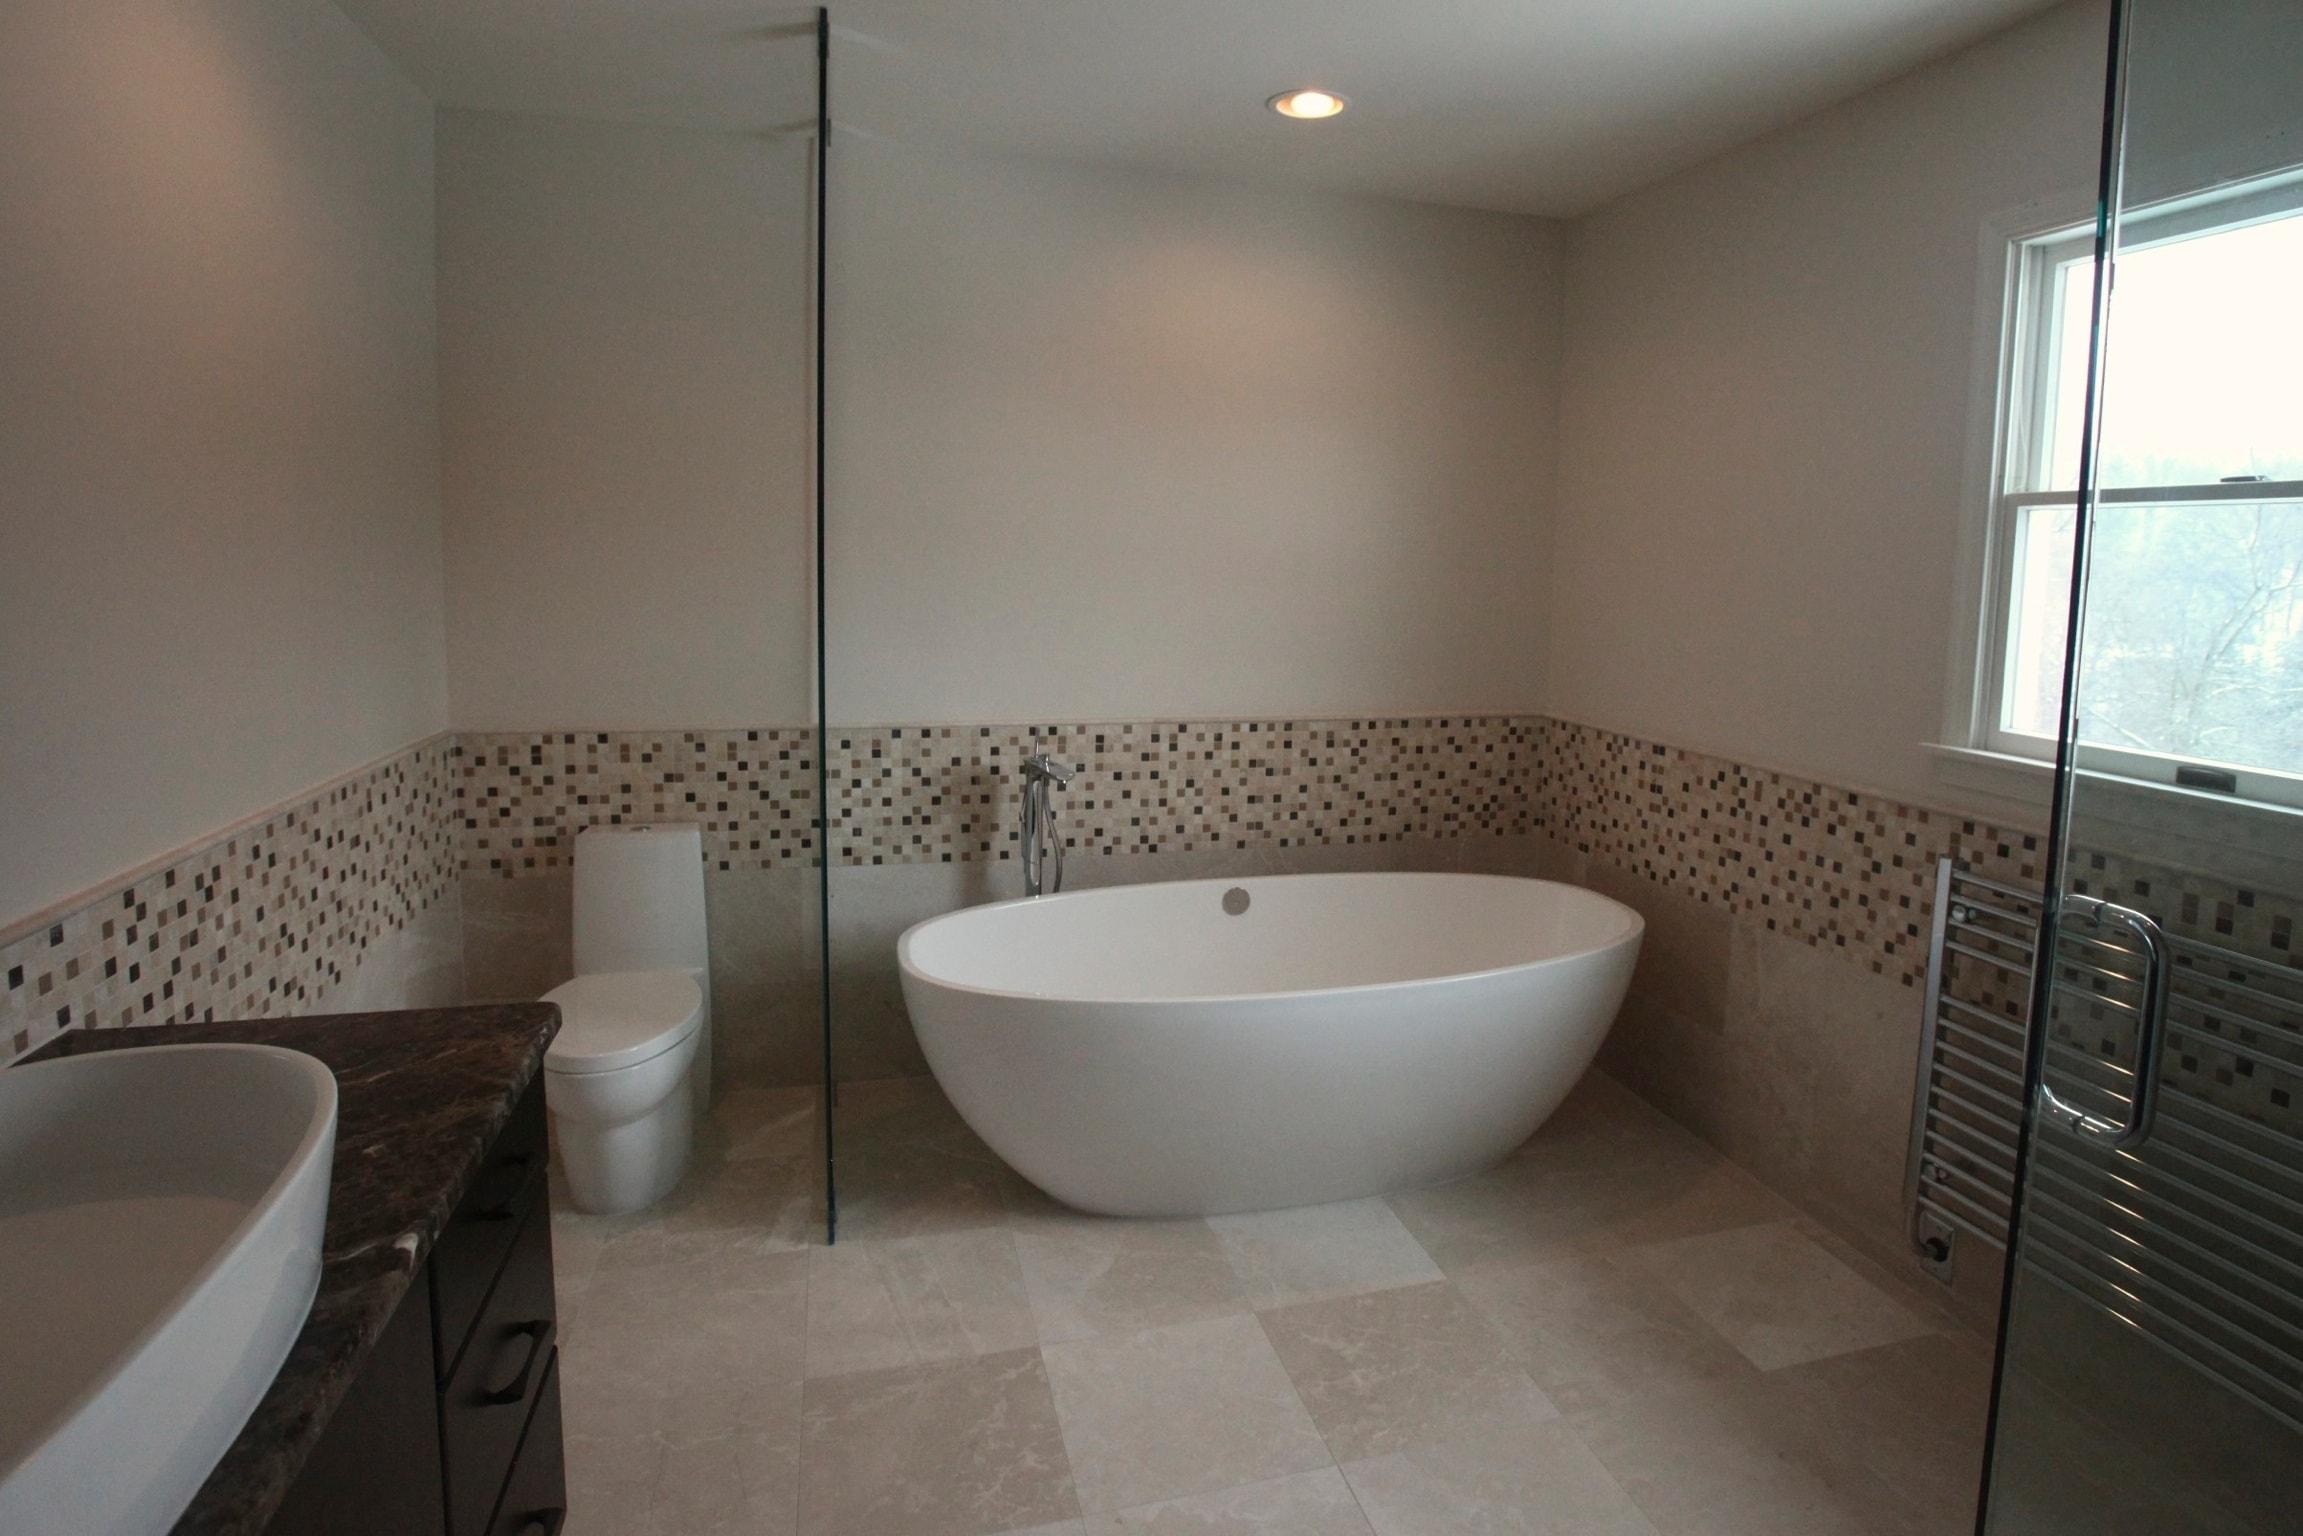 Reifschneider Toilet Area 2.9.12-min